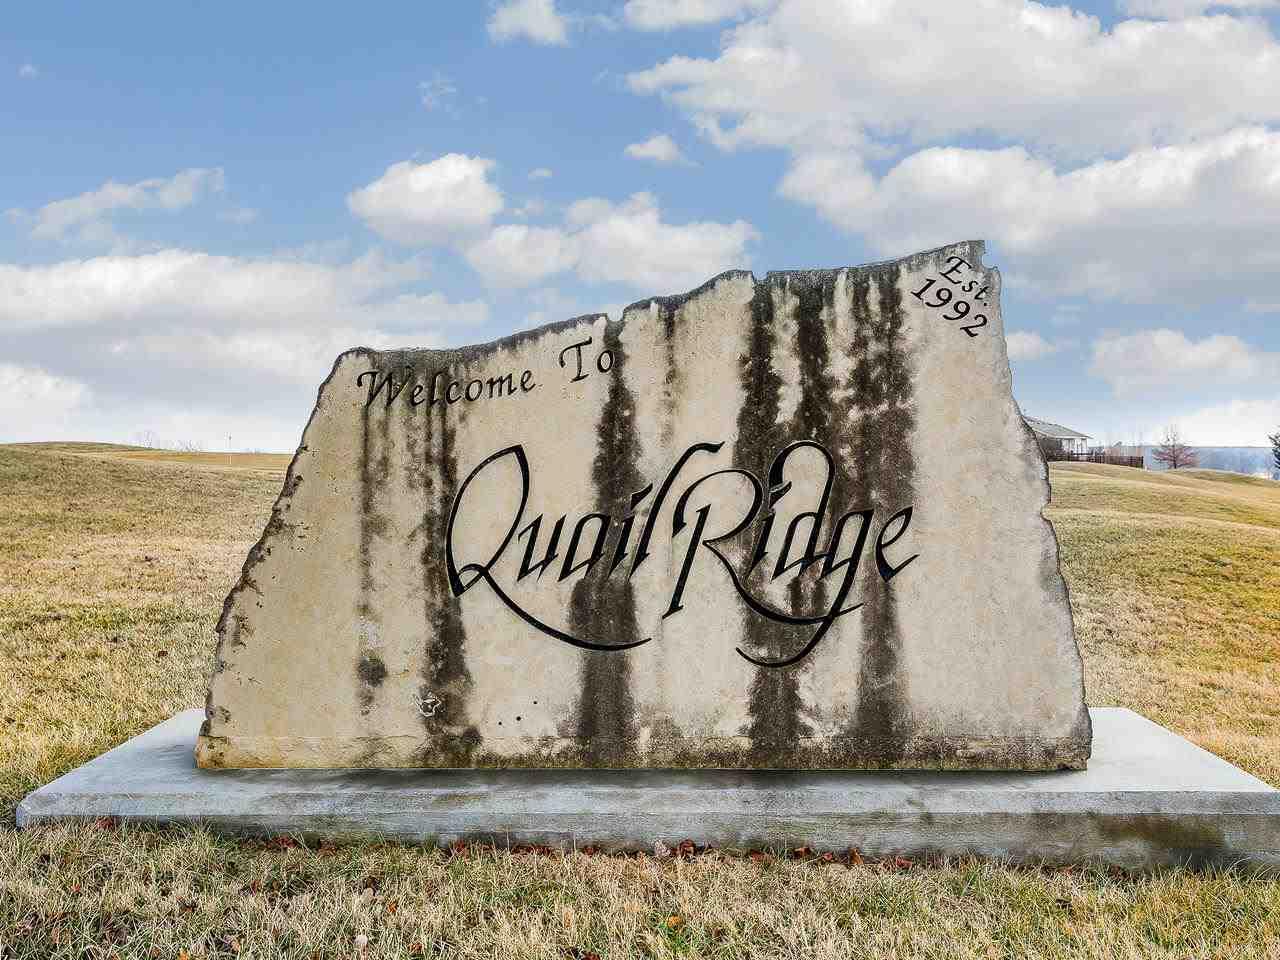 4306 Quail Ridge Dr